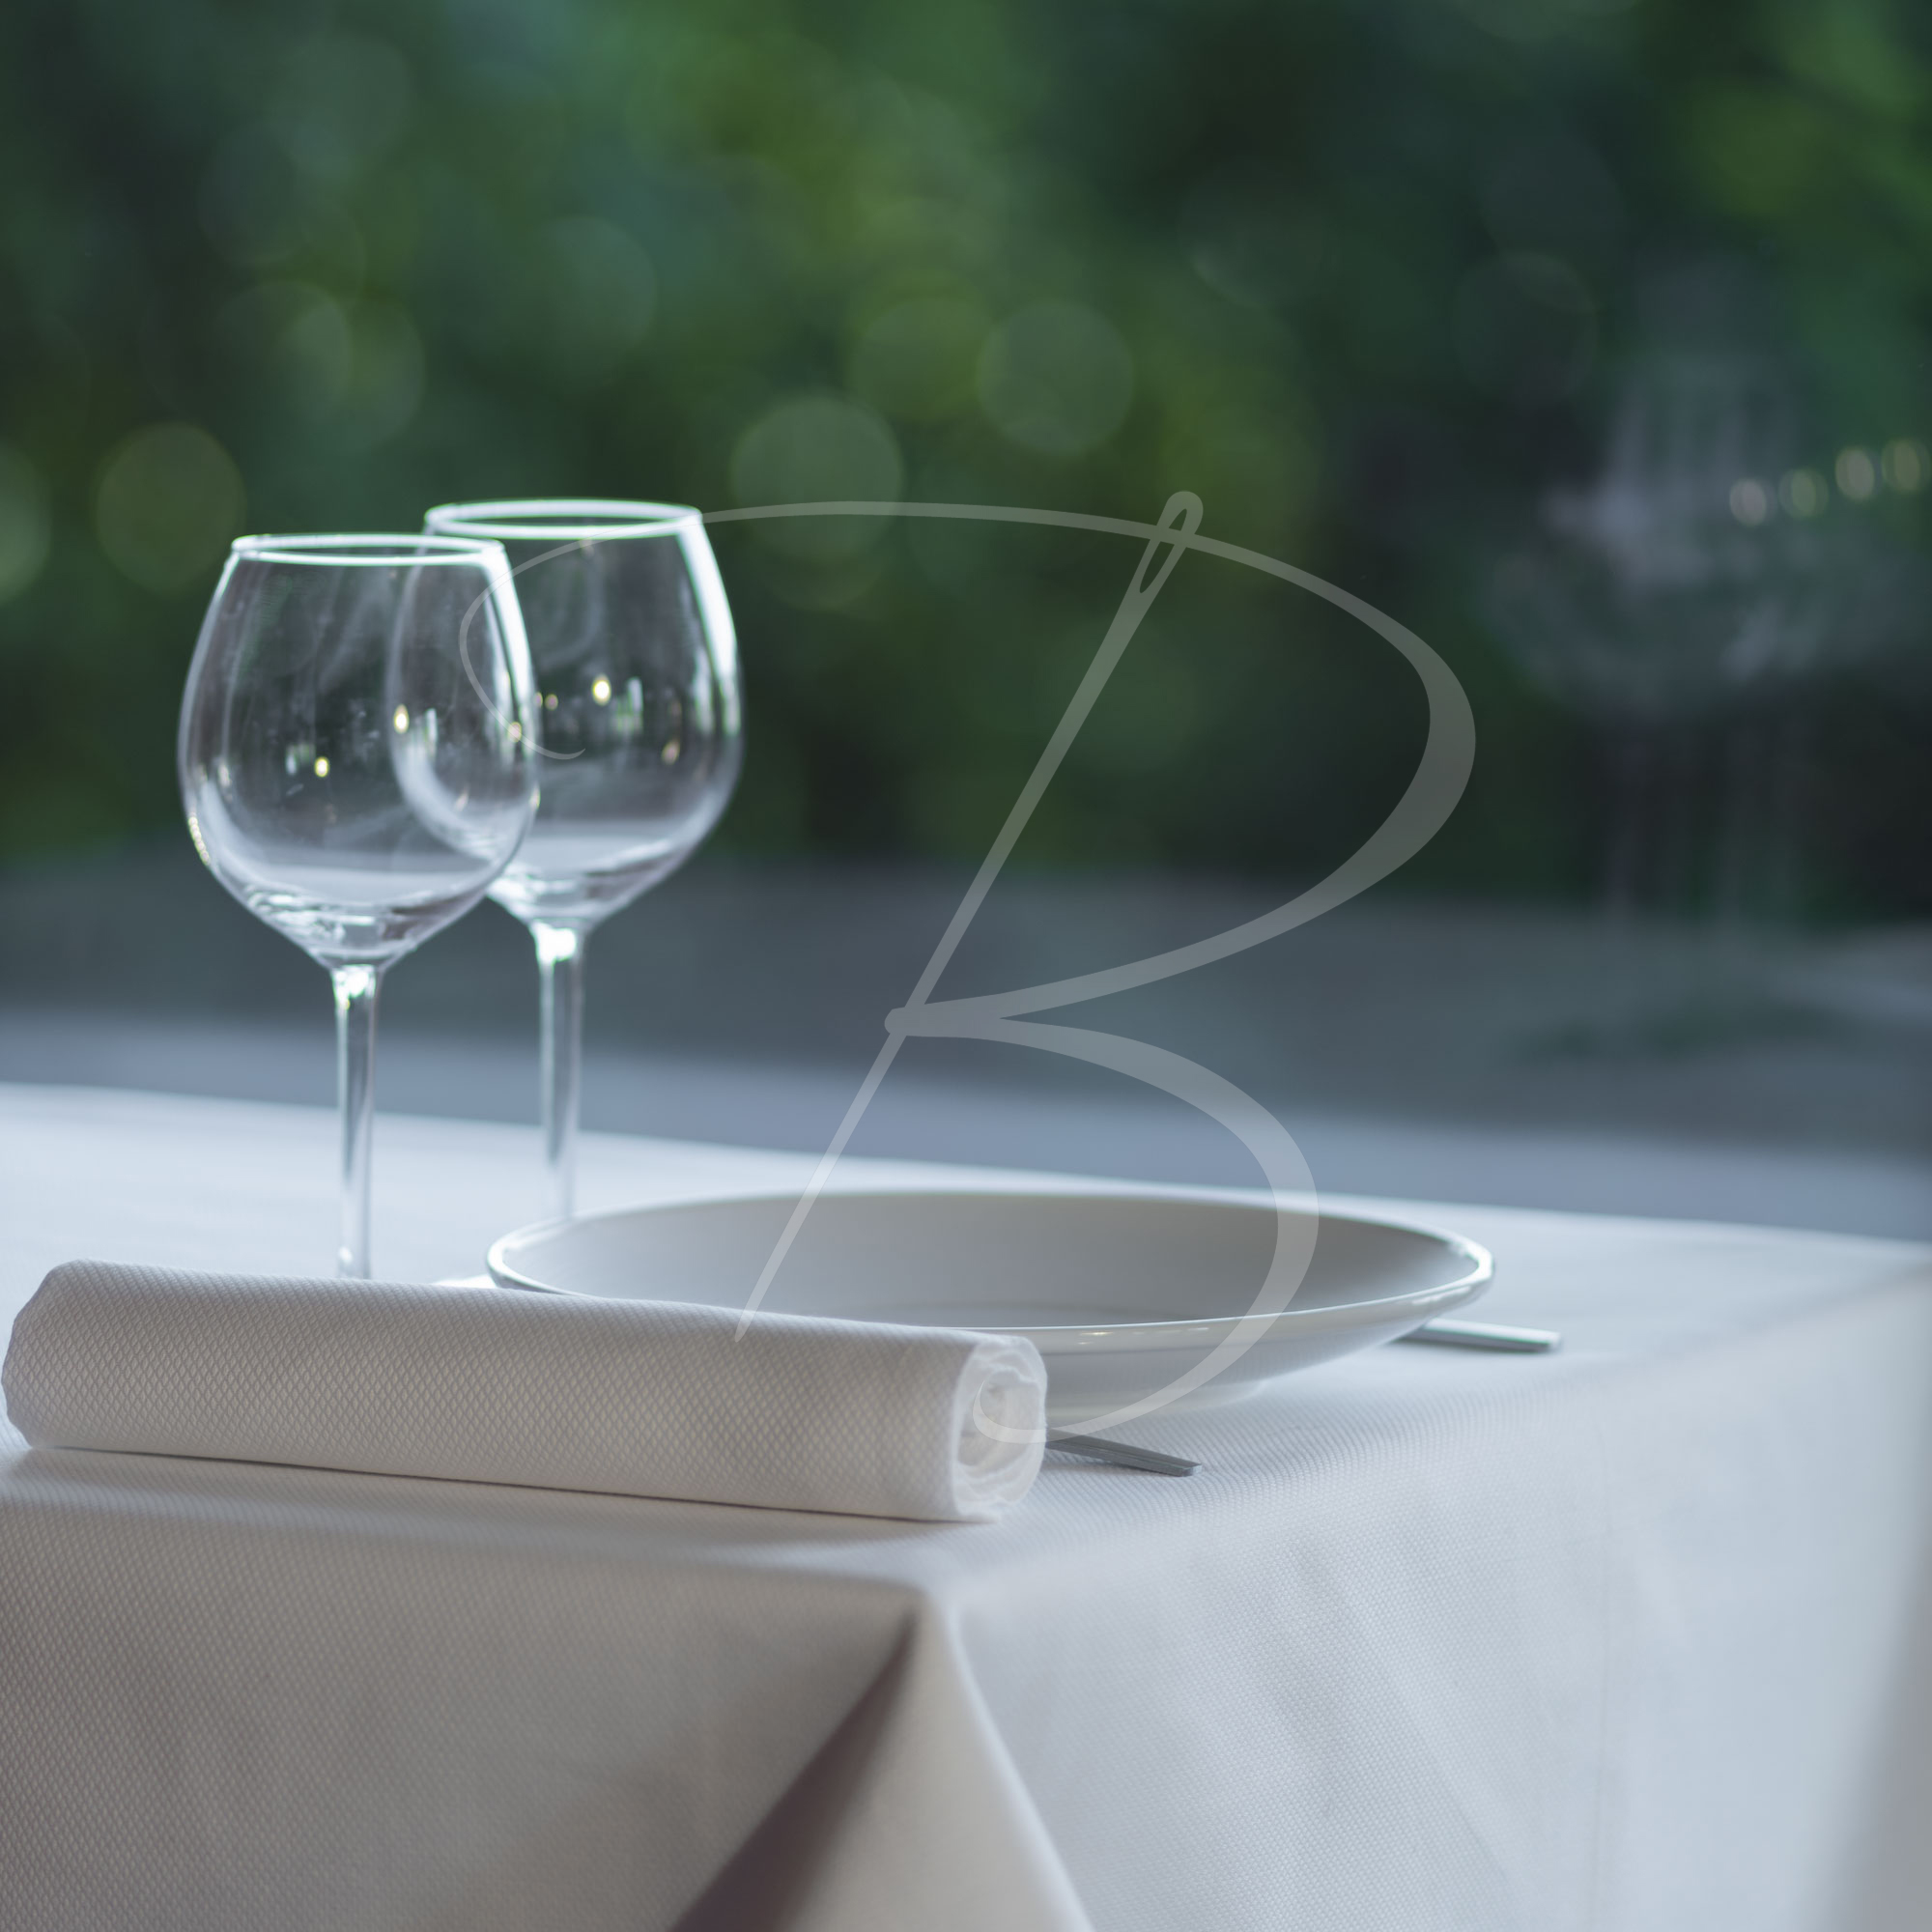 linge-table-fronton-coton